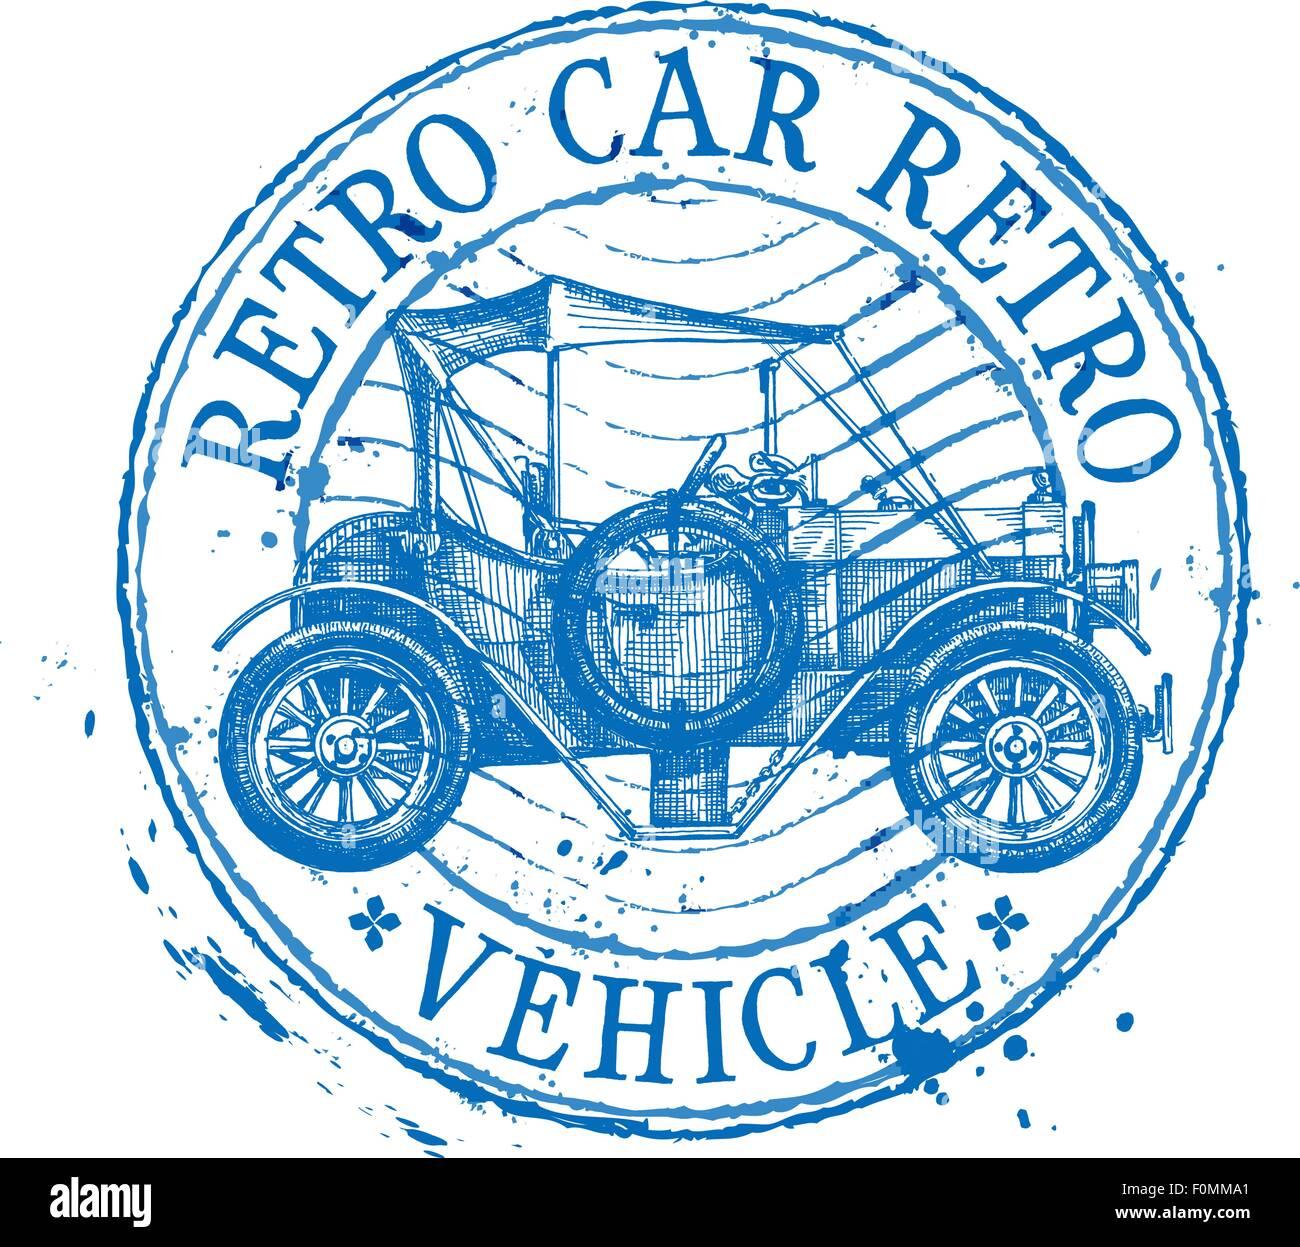 696088ddda car vector logo design template. vehicle or automobile